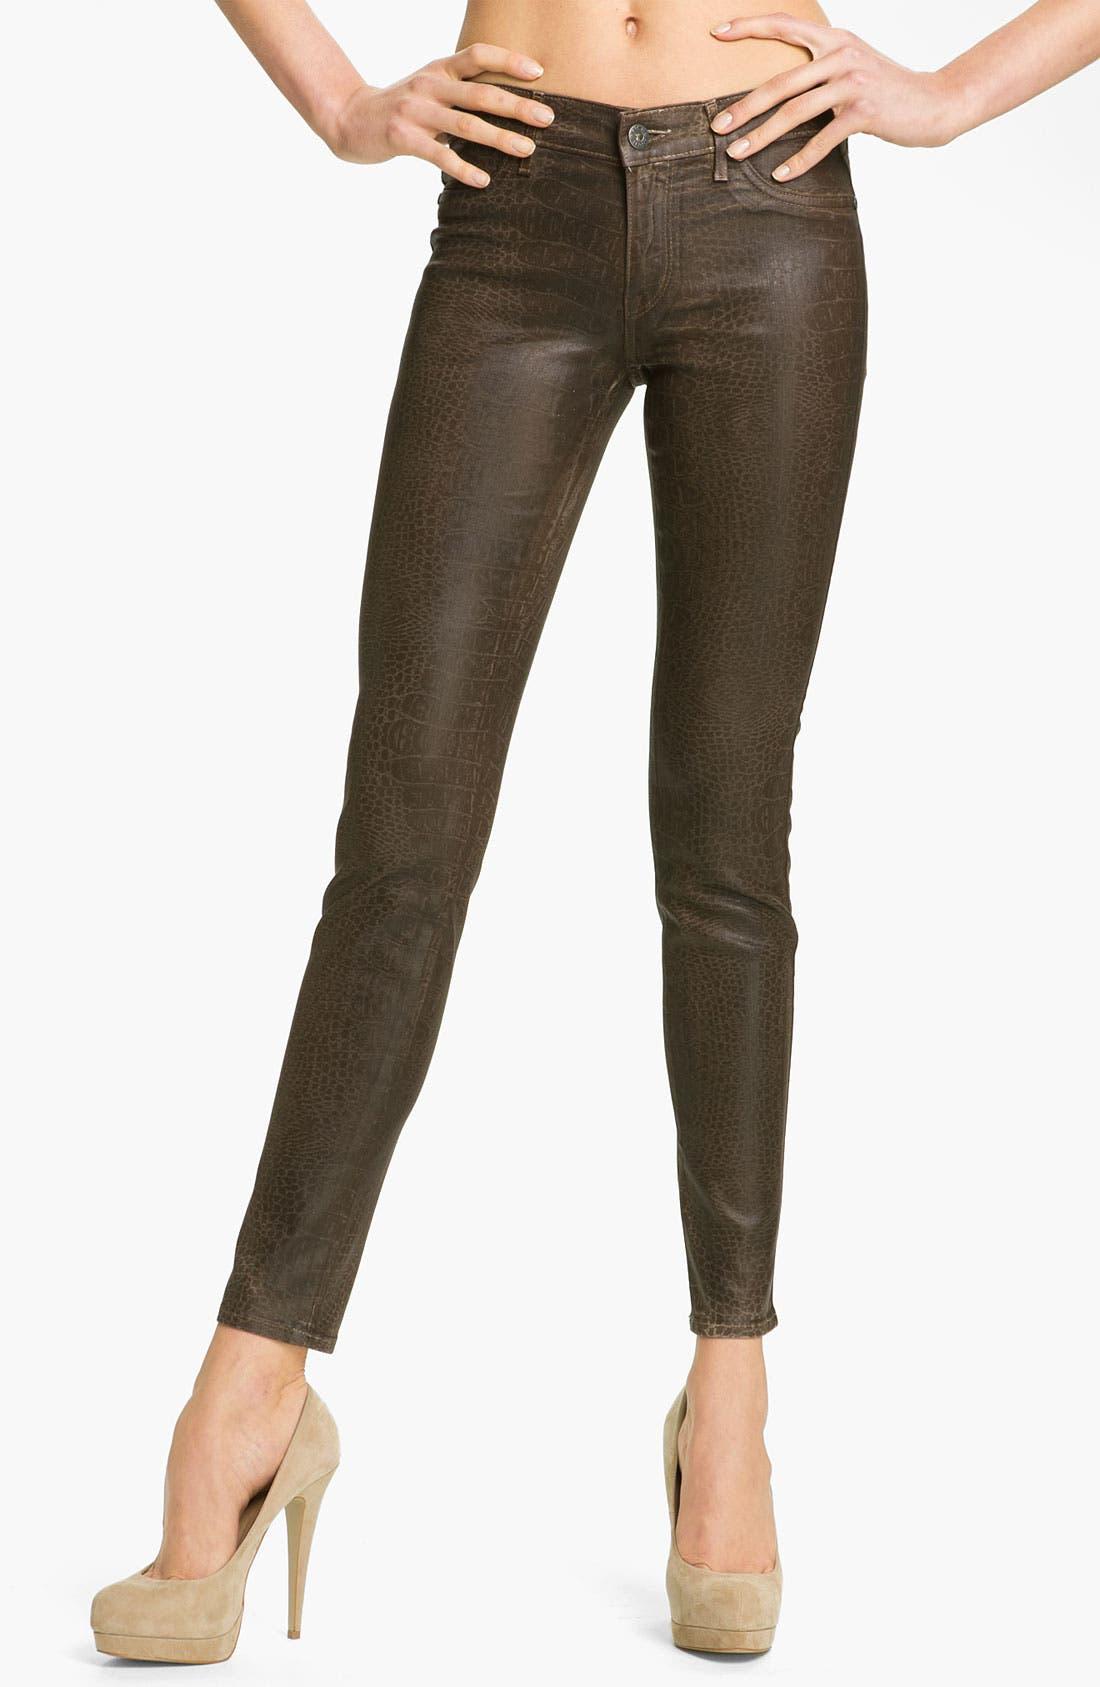 Main Image - Rich & Skinny 'Legacy' Coated Skinny Jeans (Marsh Croc)